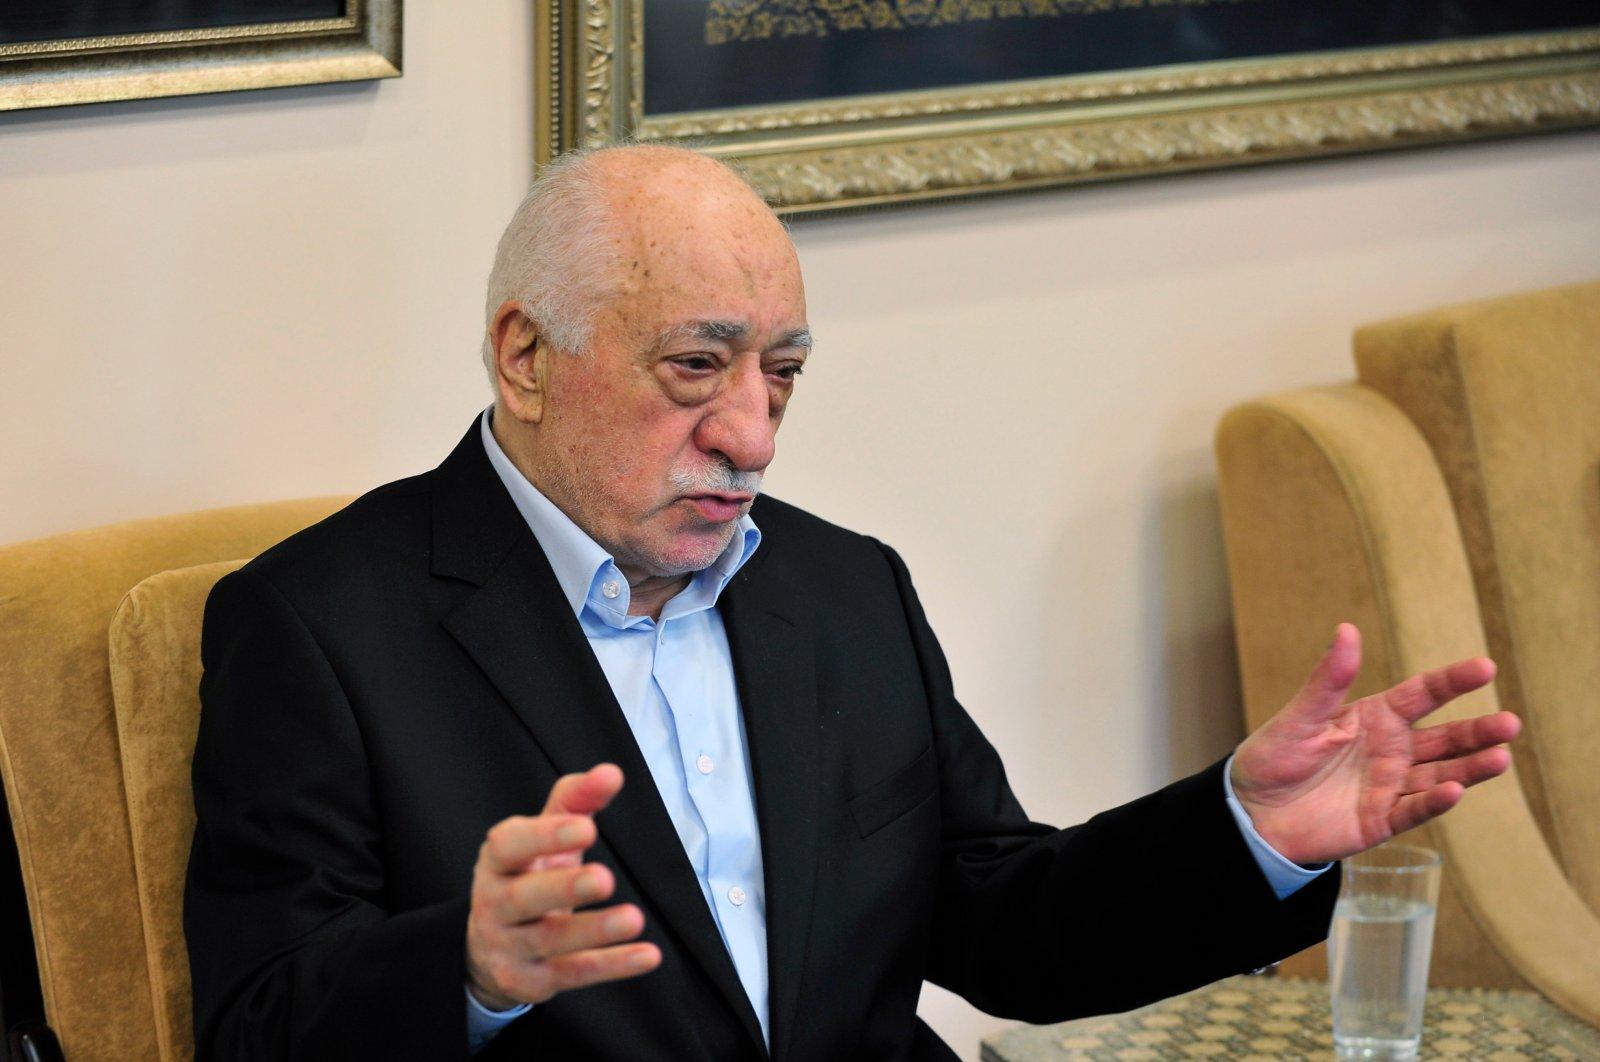 FETÖ leader Fetullah Gülen faces multiple life sentences in trials in Turkey. (AP Photo)